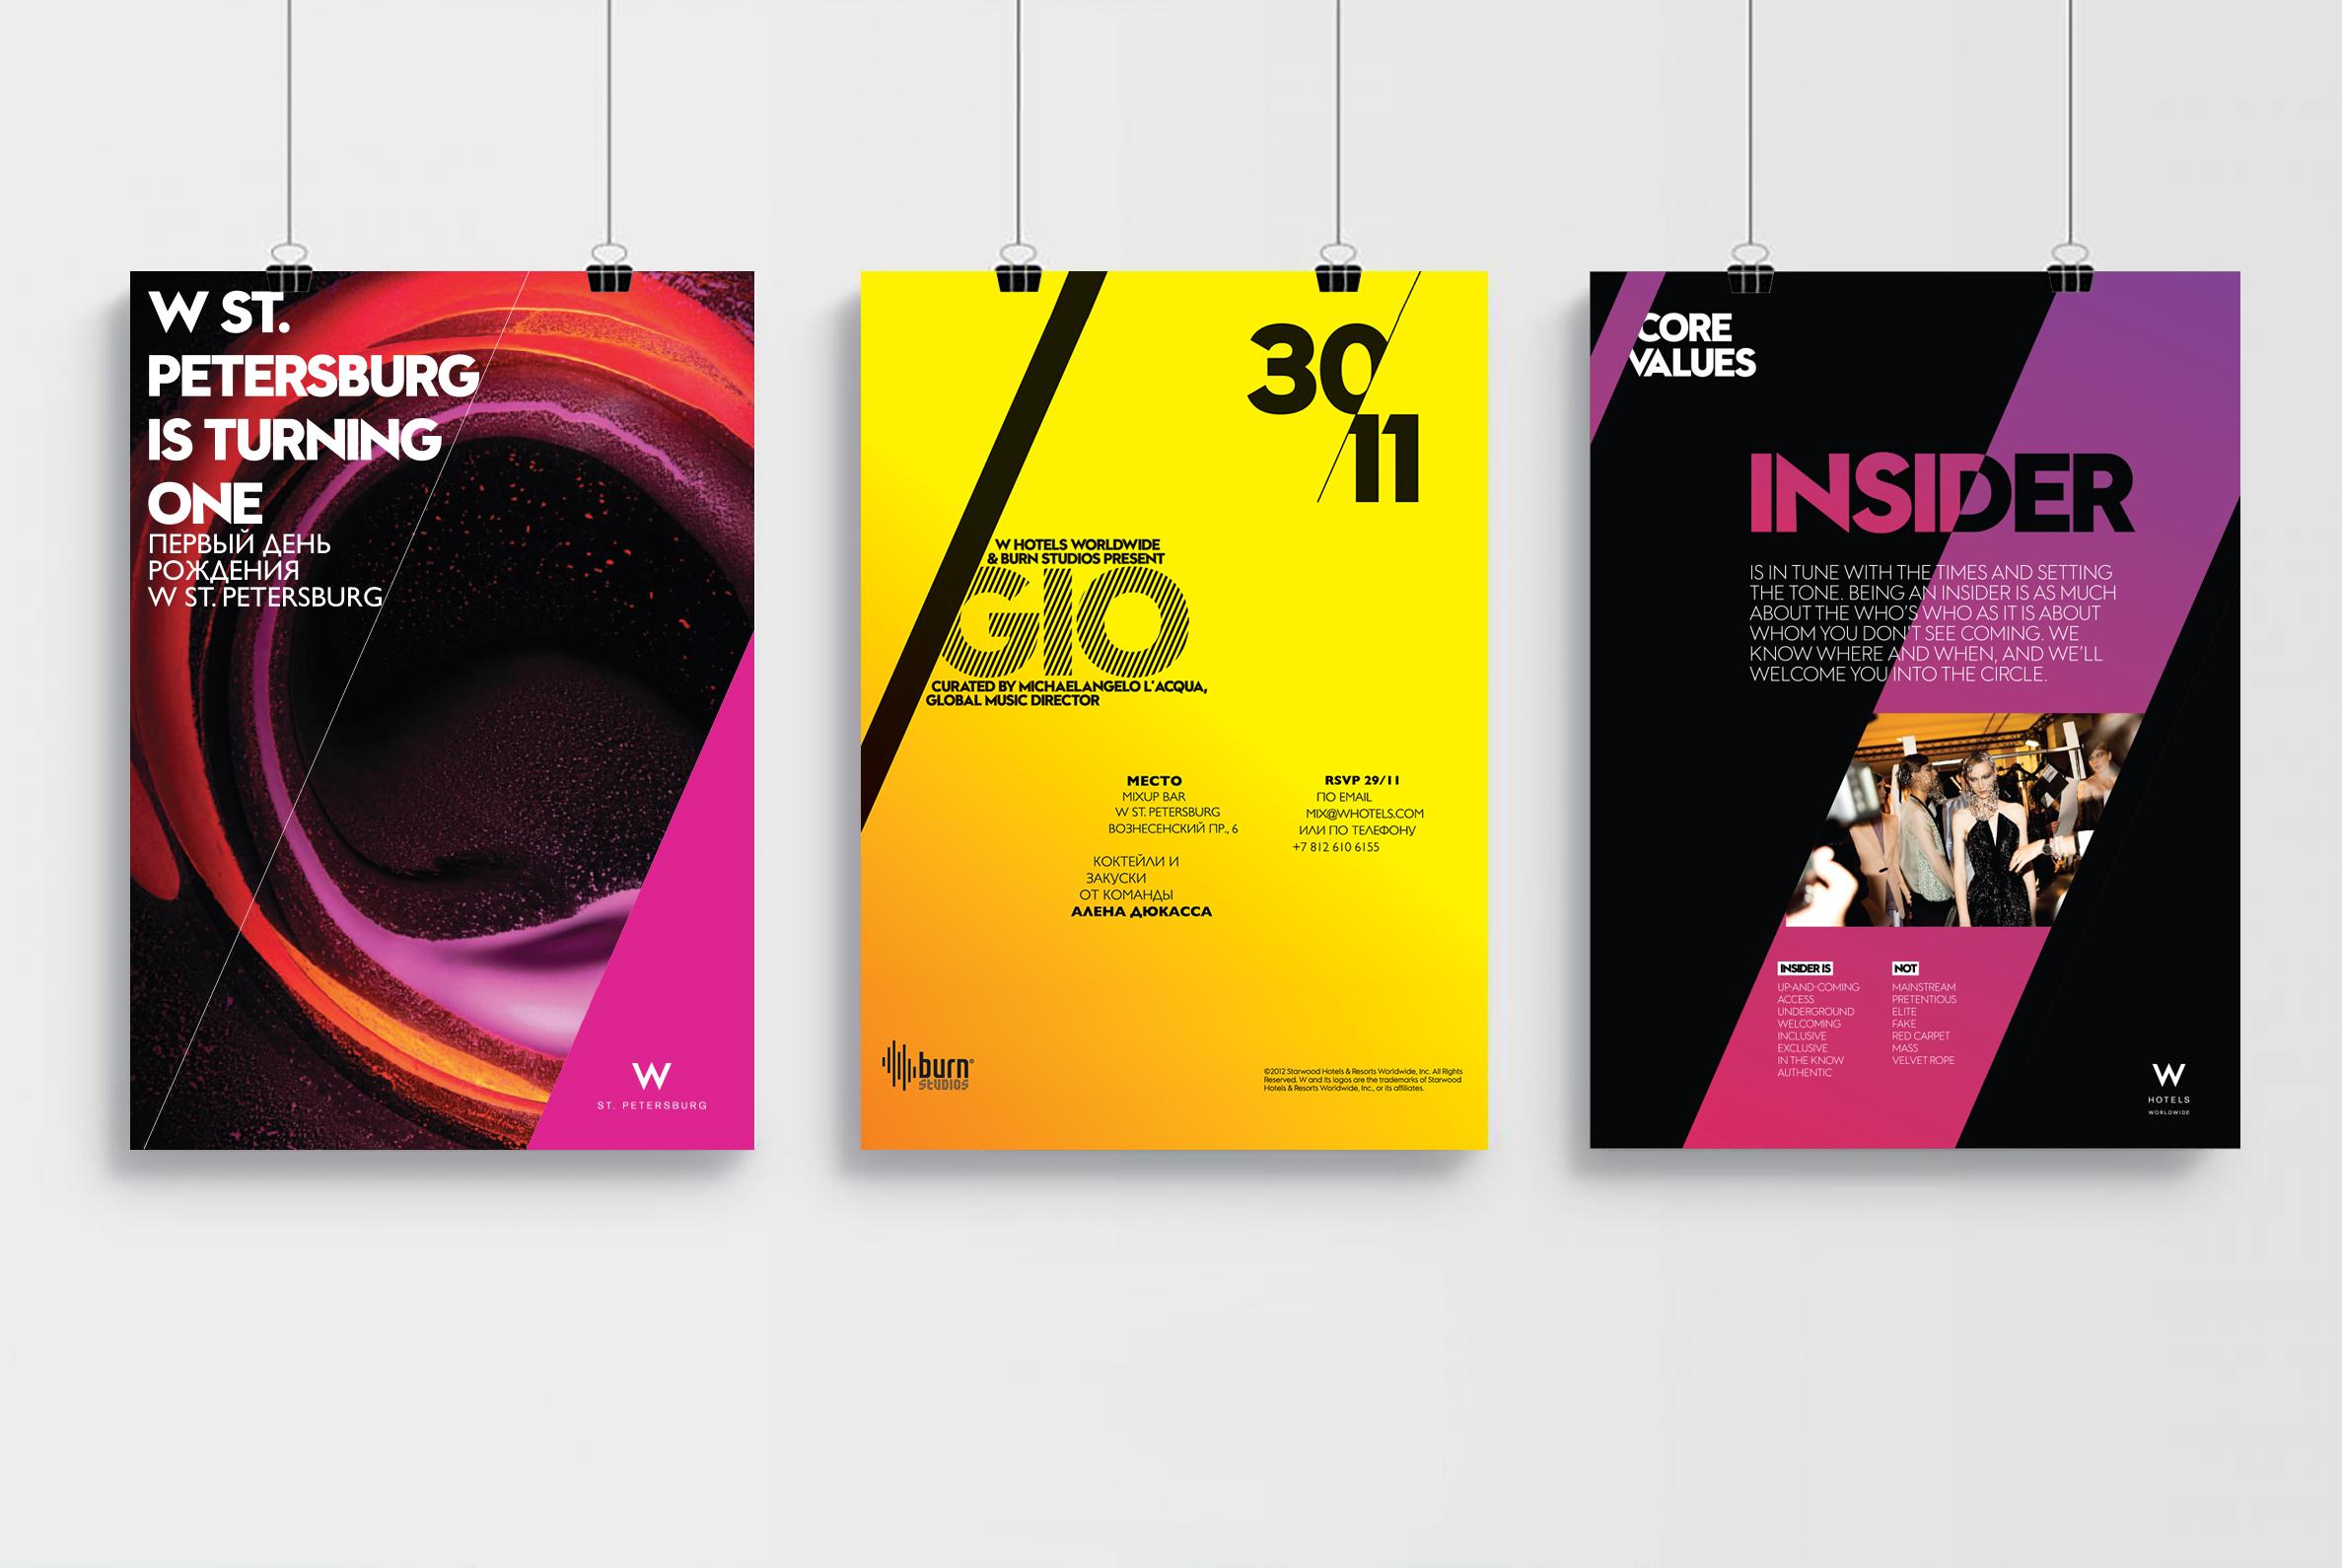 3-Creative-Display-PSD-Template-Poster-Mockup-600-1140x763